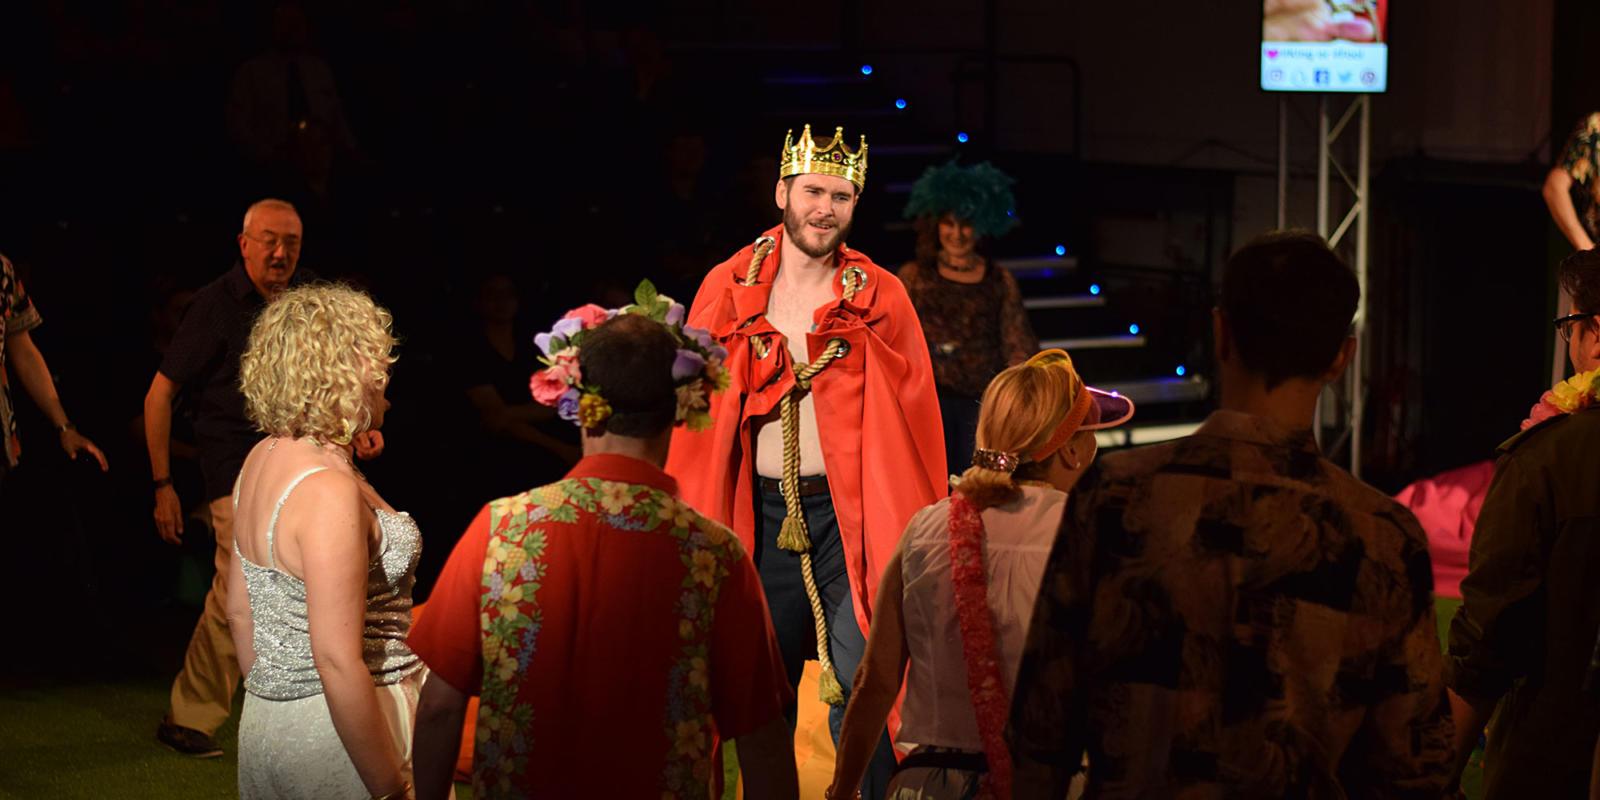 ENO Studio Live: Acis and Galatea Matthew Durkan and members of the ENO Chorus (c) Dani Harvey